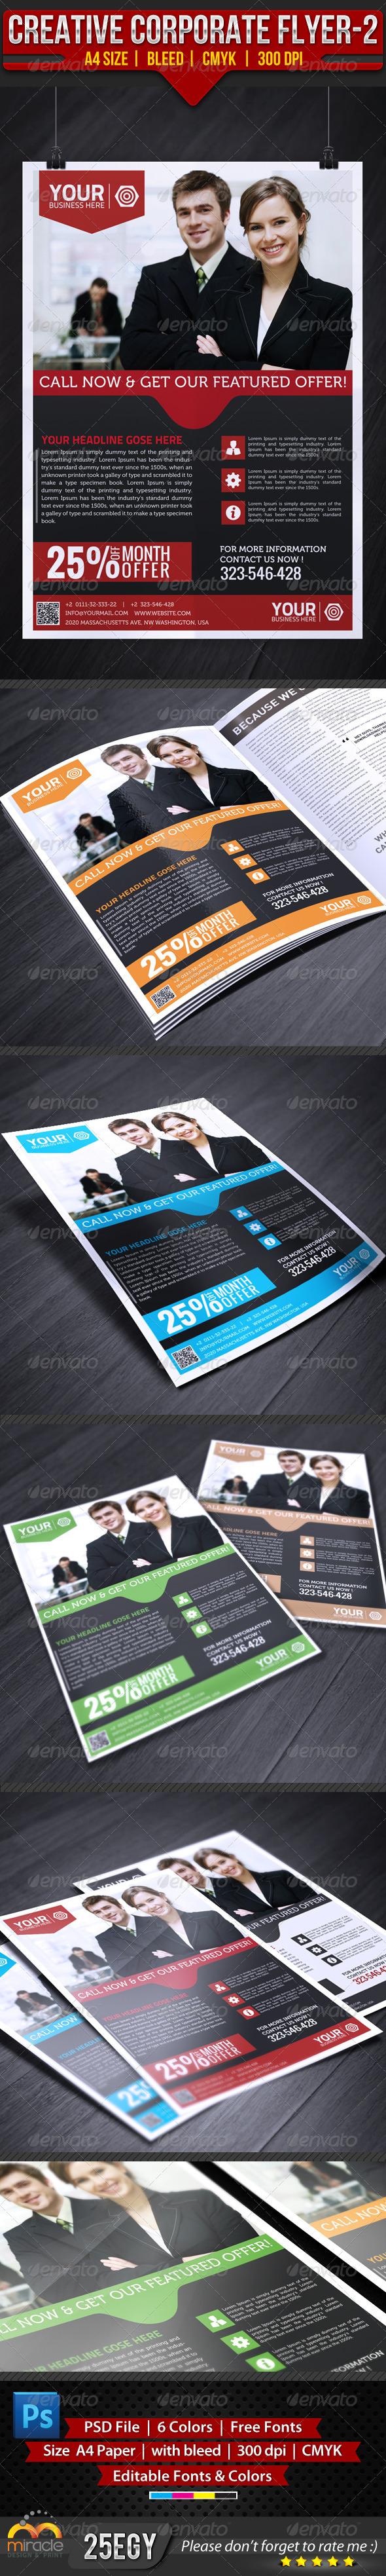 Creative Corporate Flyer 2 - Corporate Flyers